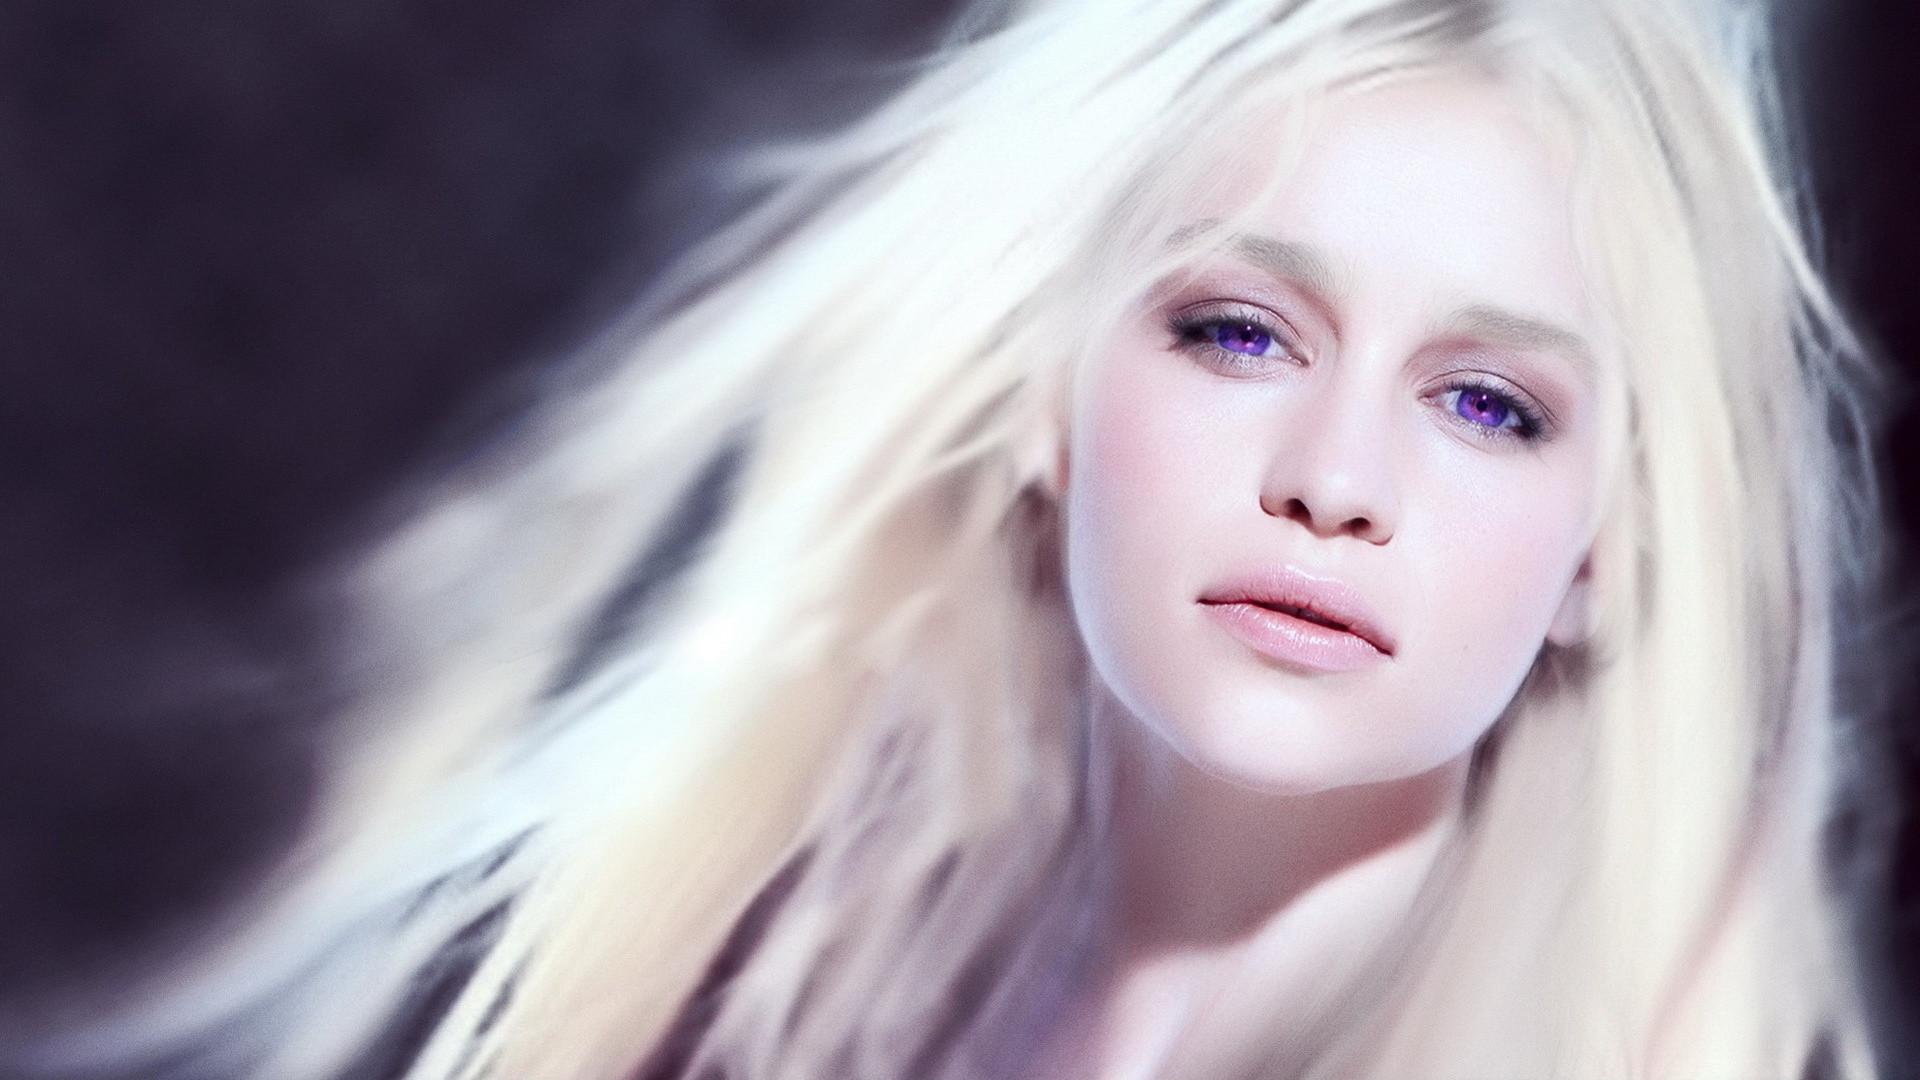 1920x1080 Wallpaper Daenerys Targaryen Season 4 Game Of Thrones Emilia Clarke 4K TV Series 1123